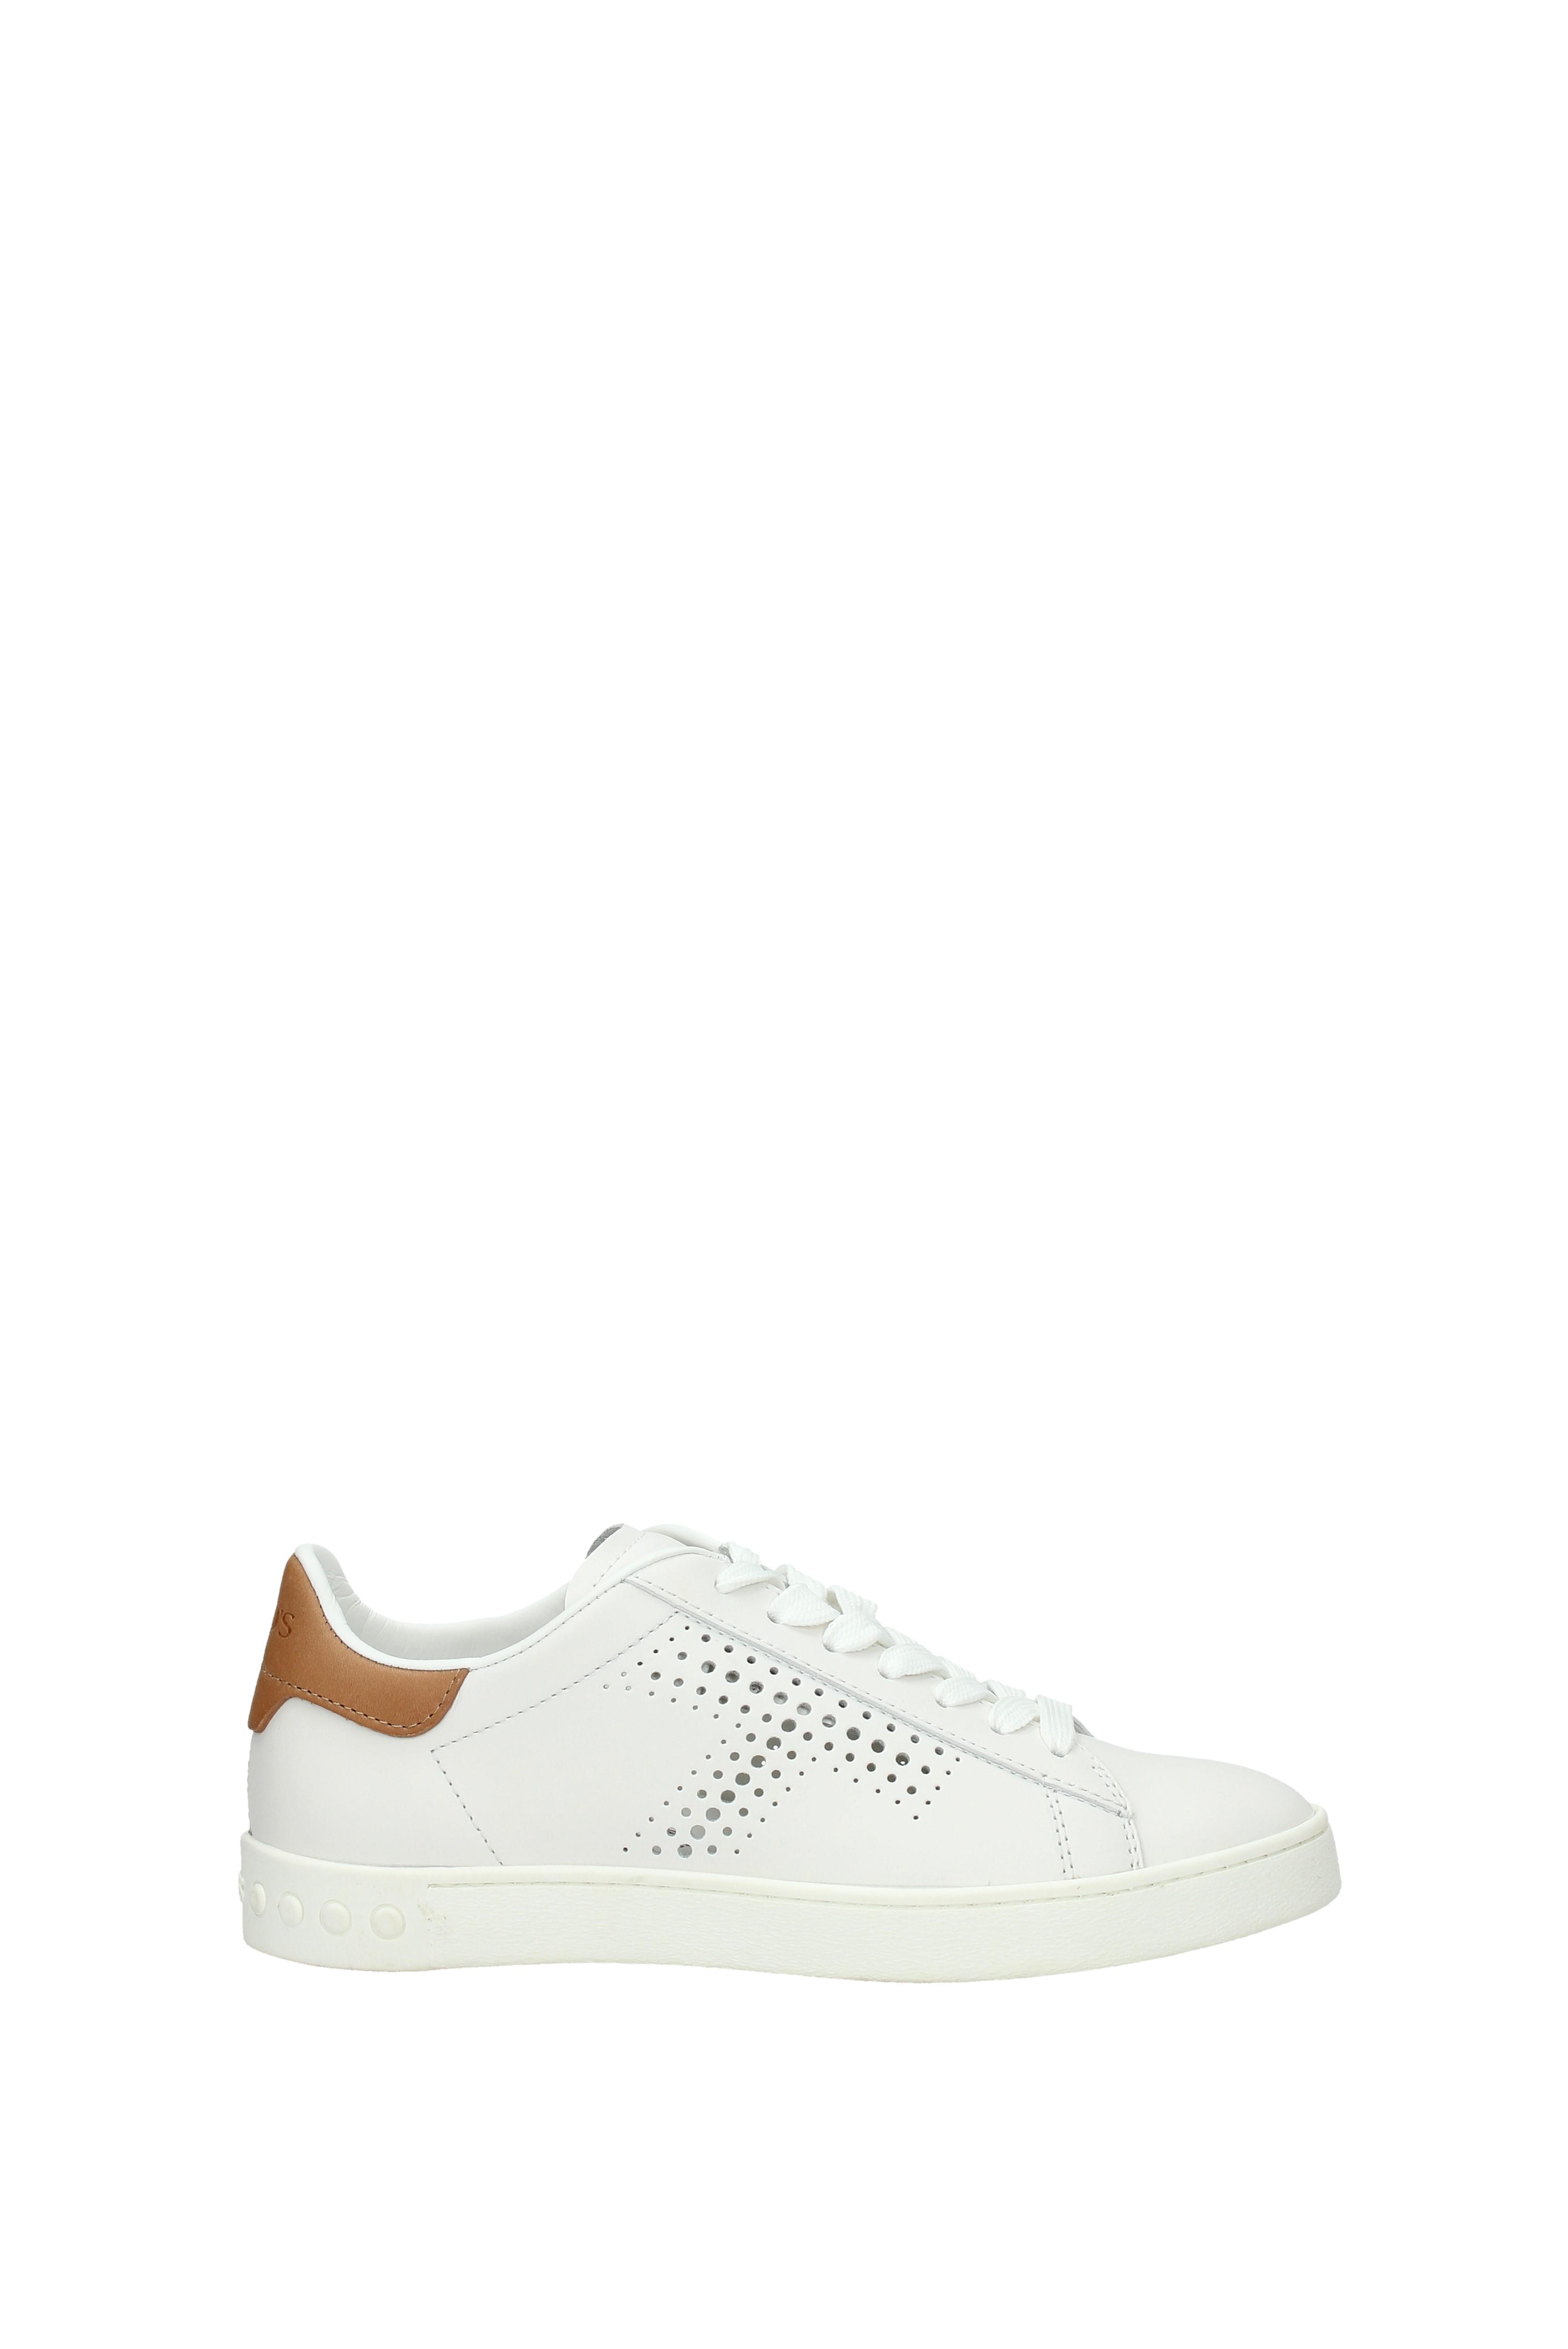 Sneakers (XXW12A0T490GPH) Tod's Damens - Leder (XXW12A0T490GPH) Sneakers 9b0b8f